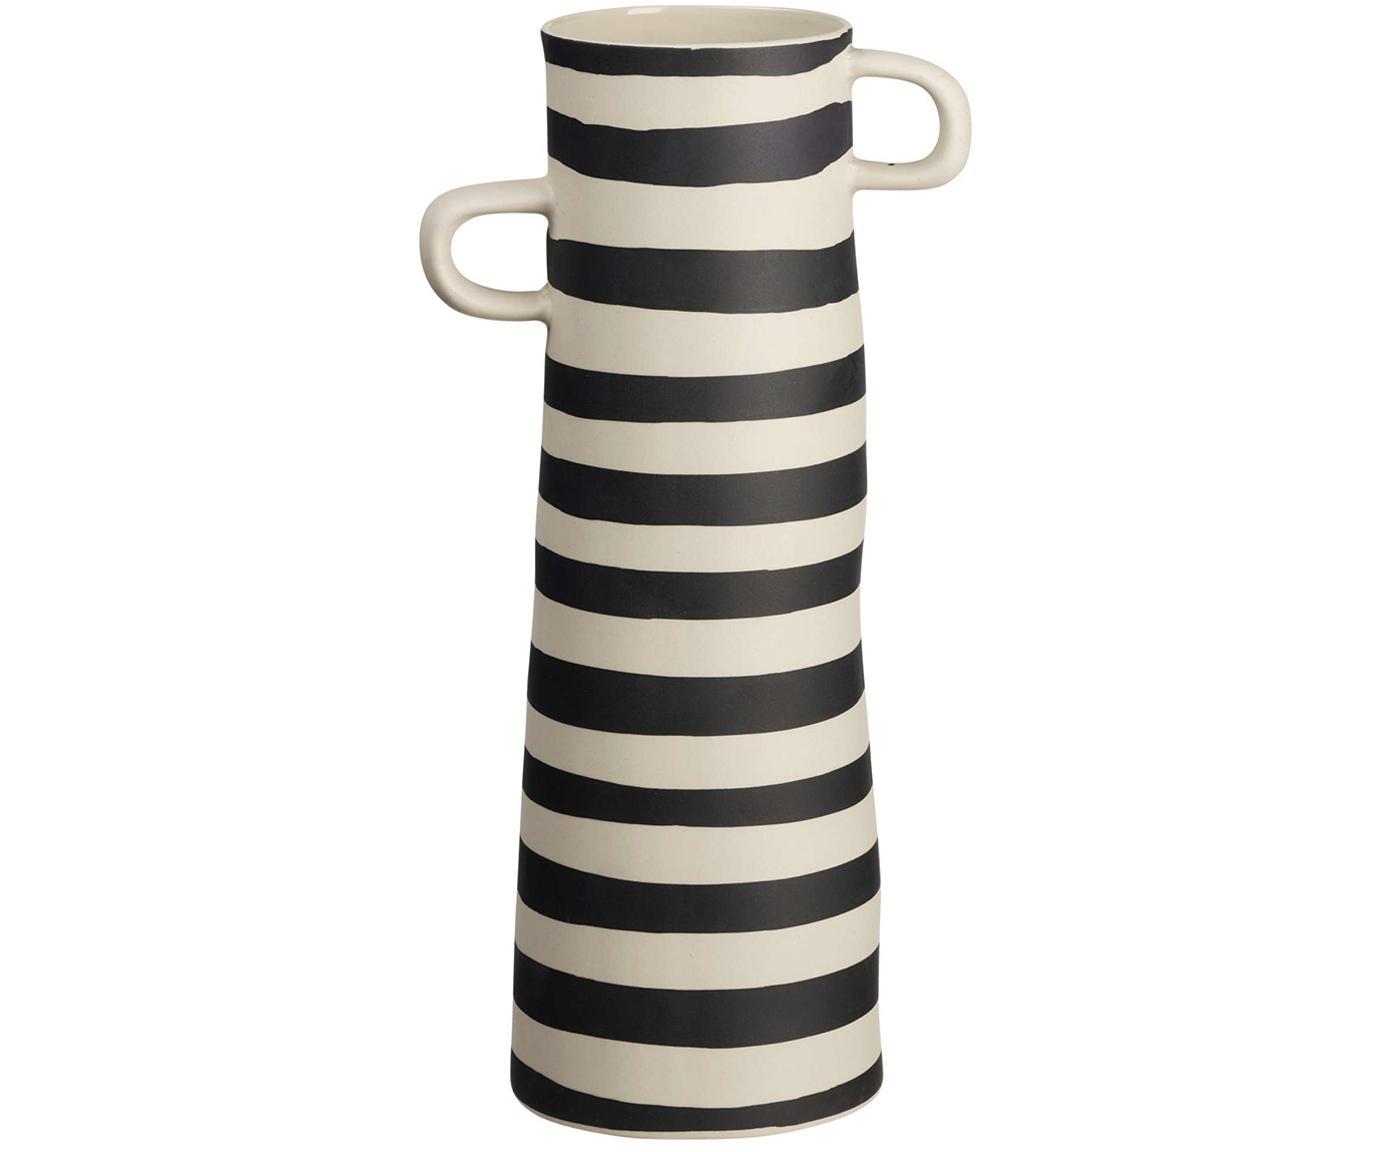 Vaso in gres fatto a mano Rayu, Terracotta, Nero, beige, Ø 10 x Alt. 28 cm